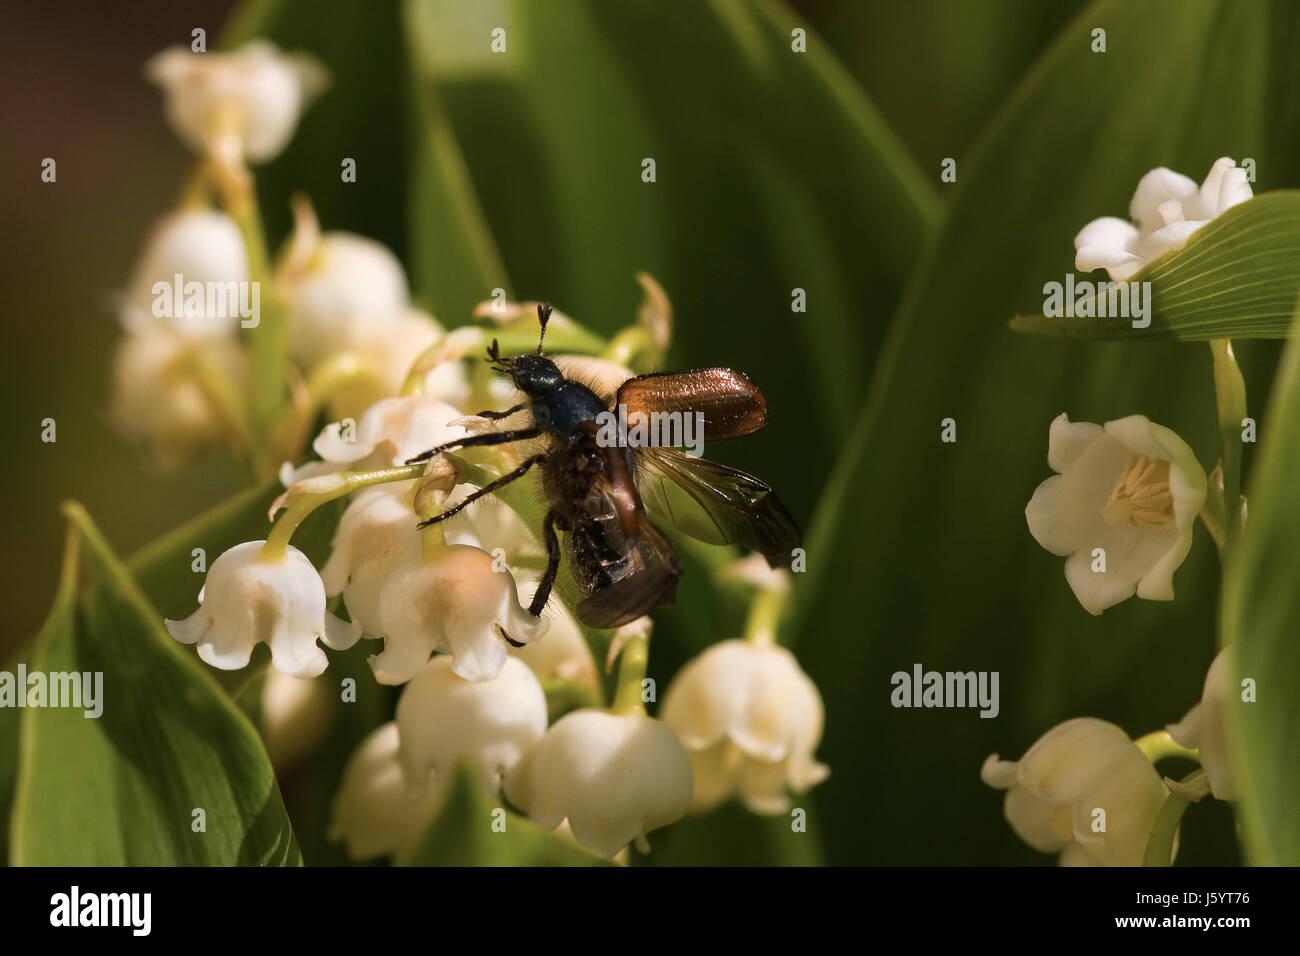 Maiglöckchen Giftig insekt kann heißhunger maikäfer maiglöckchen giftig giftig insekt